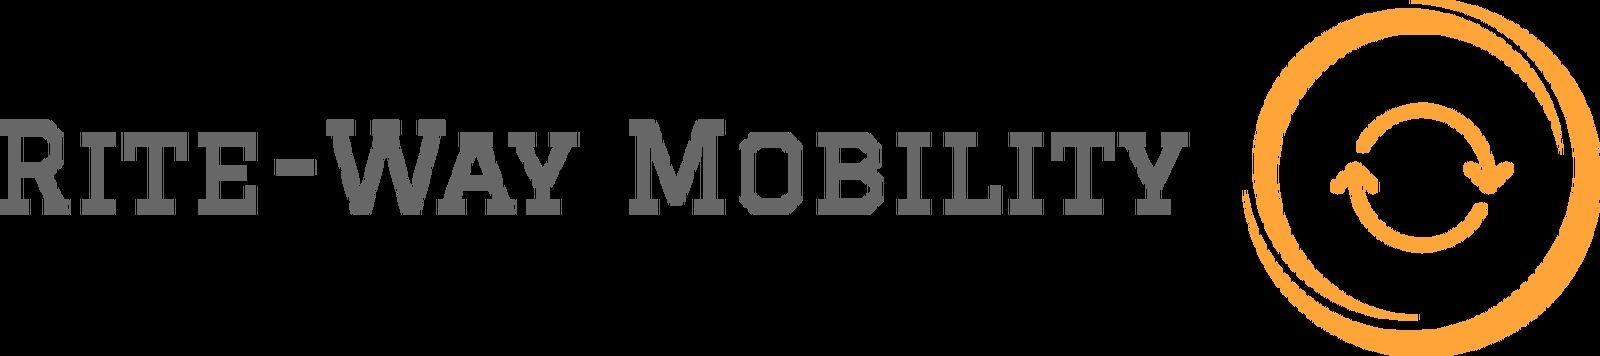 Rite-Way Mobility